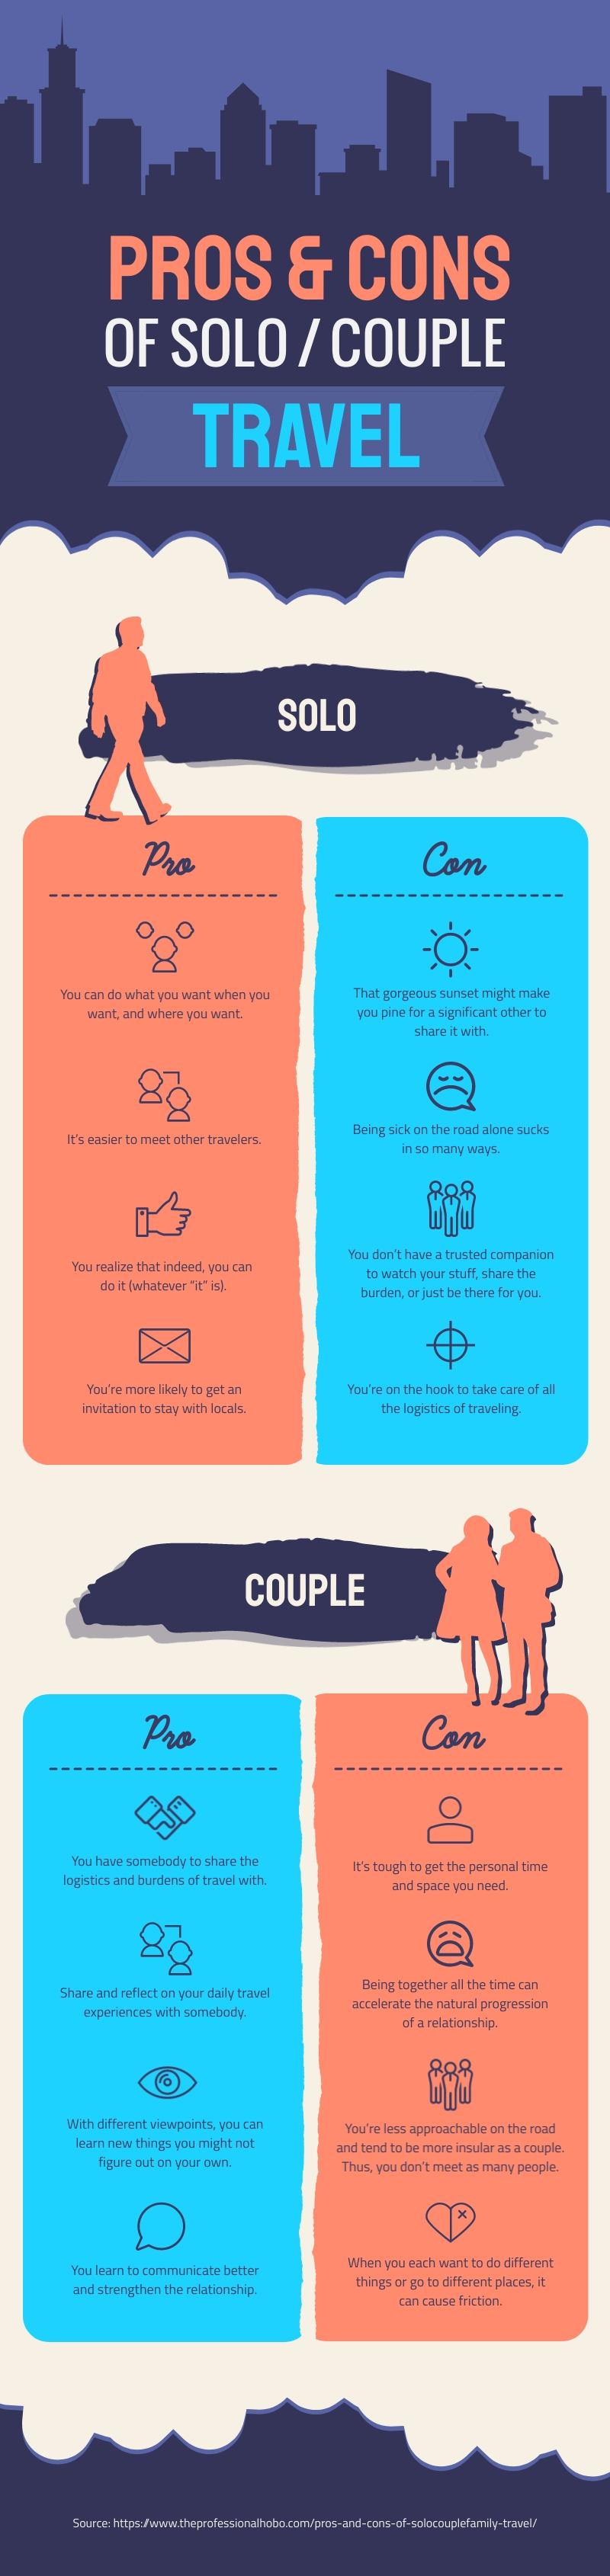 Solo vs Couple Travel - Infographic Template